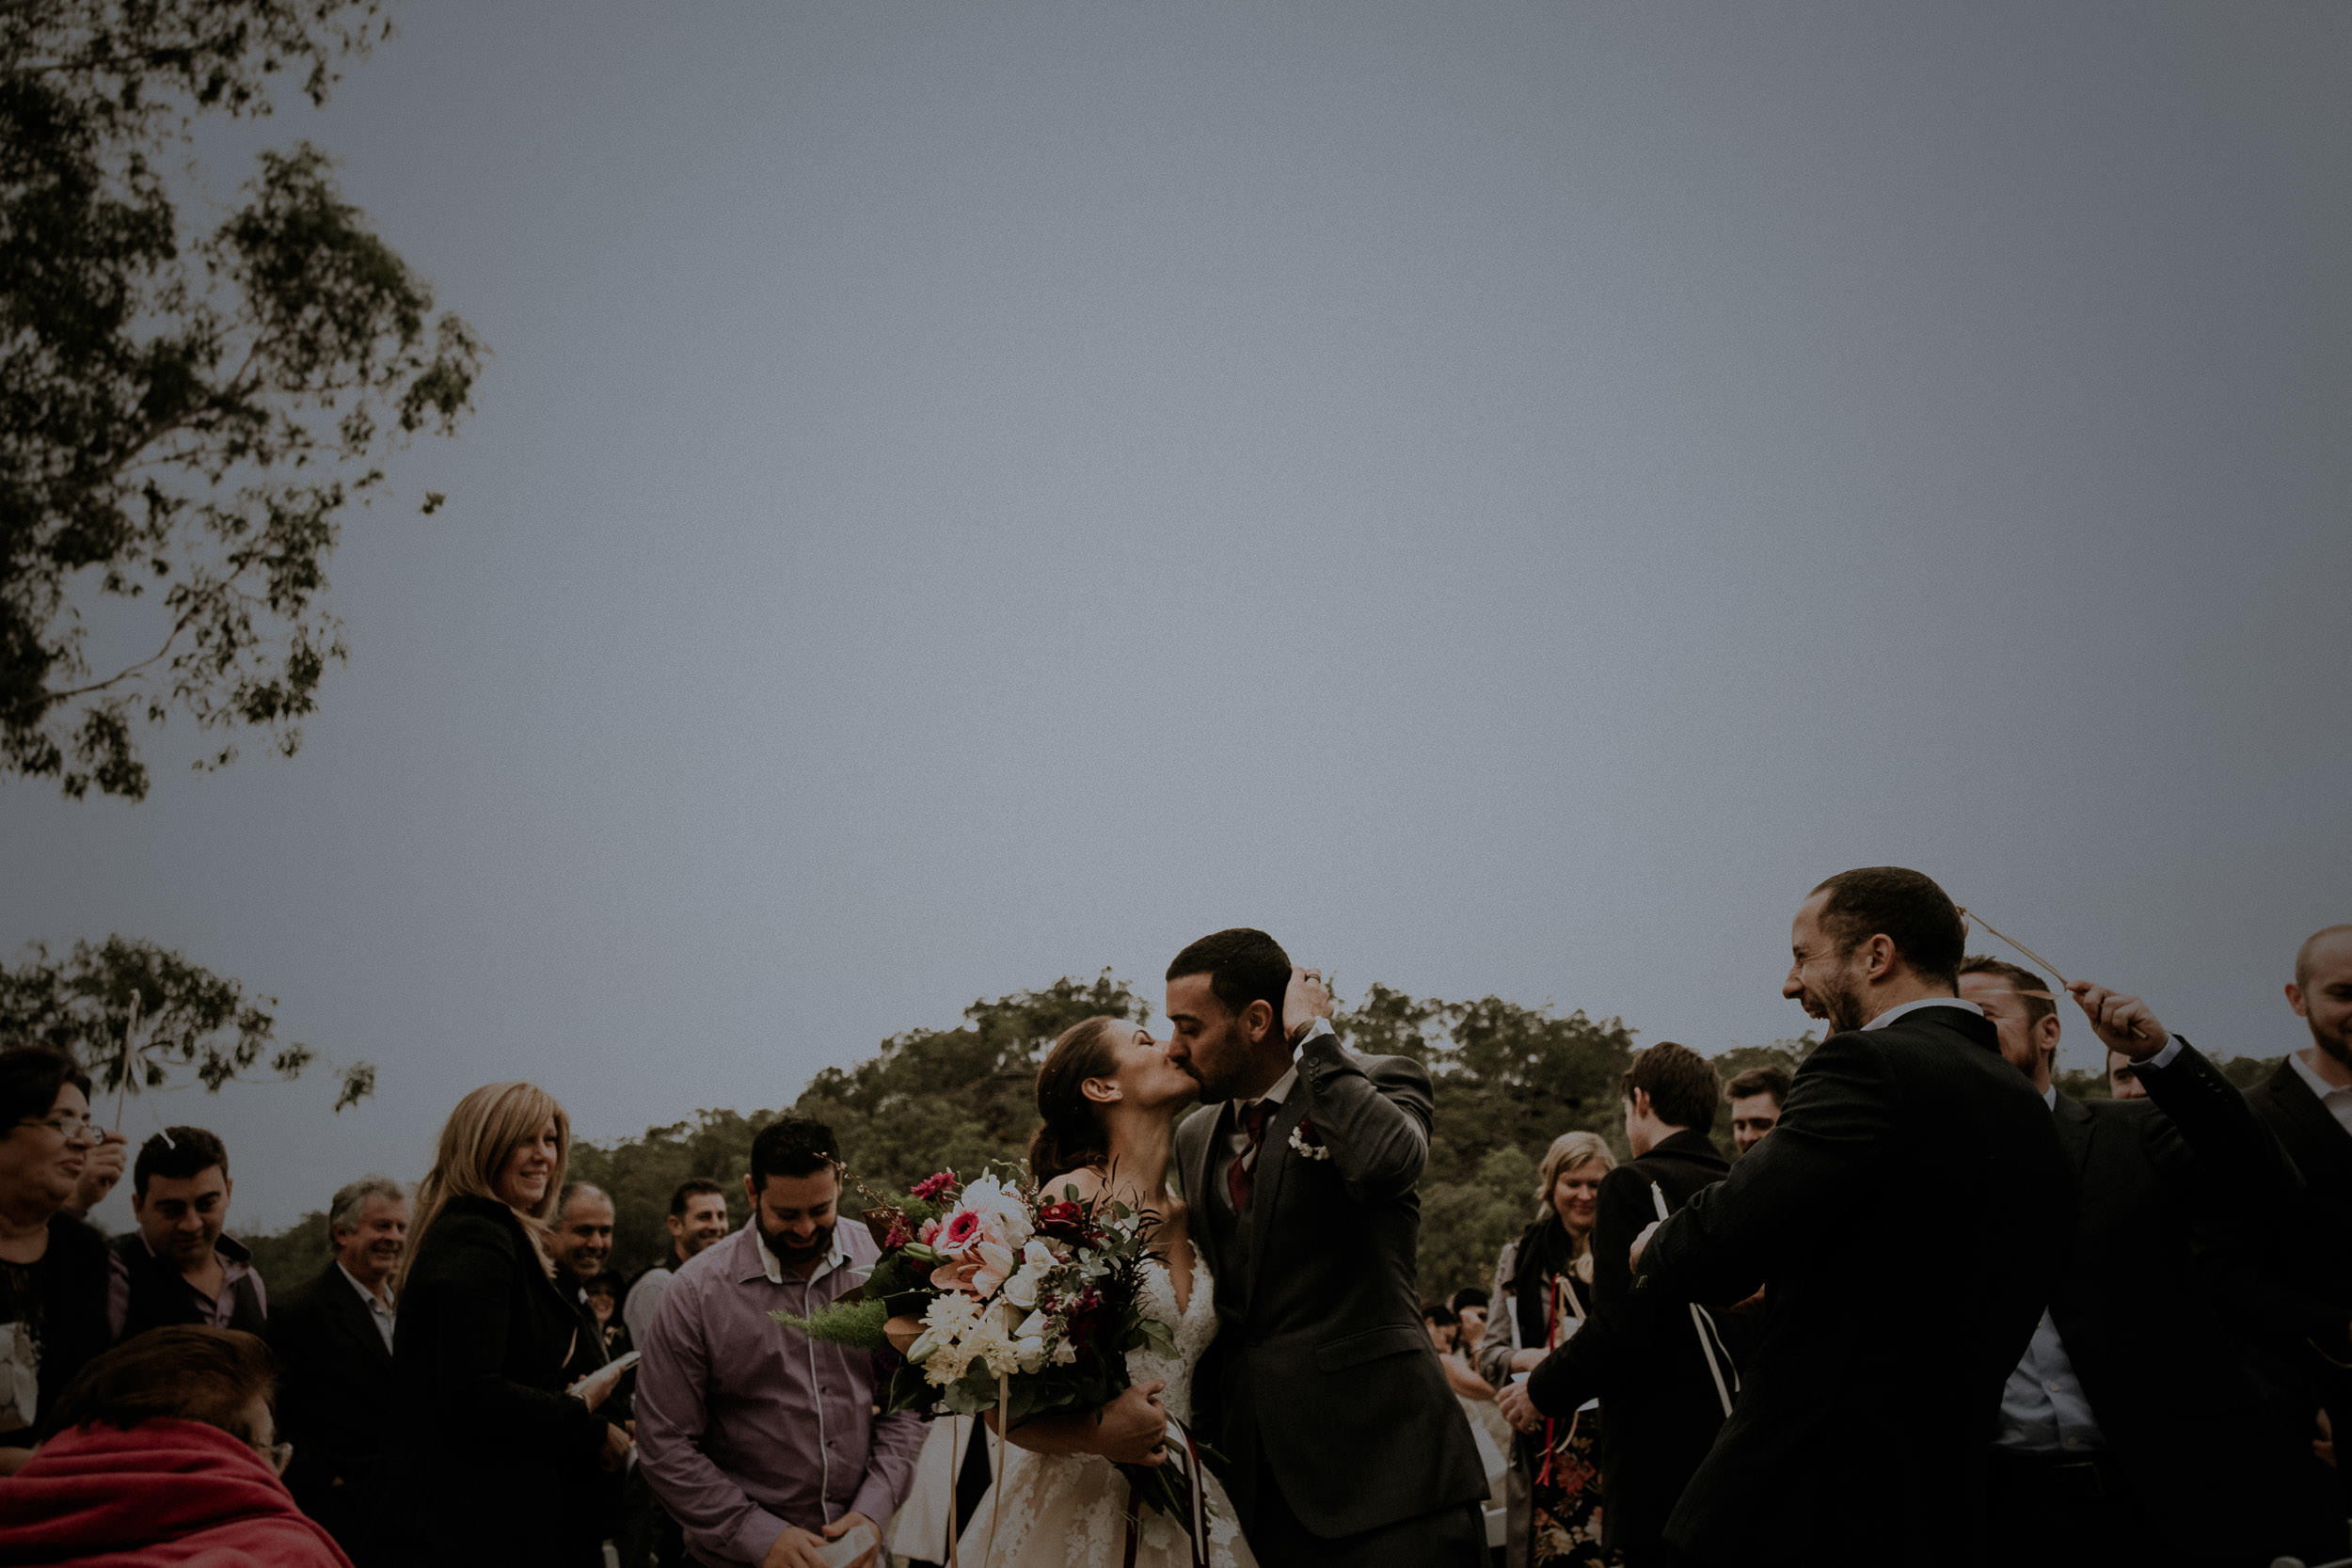 g_c wedding - kings _ thieves elopement wedding photography - blog 59.jpg